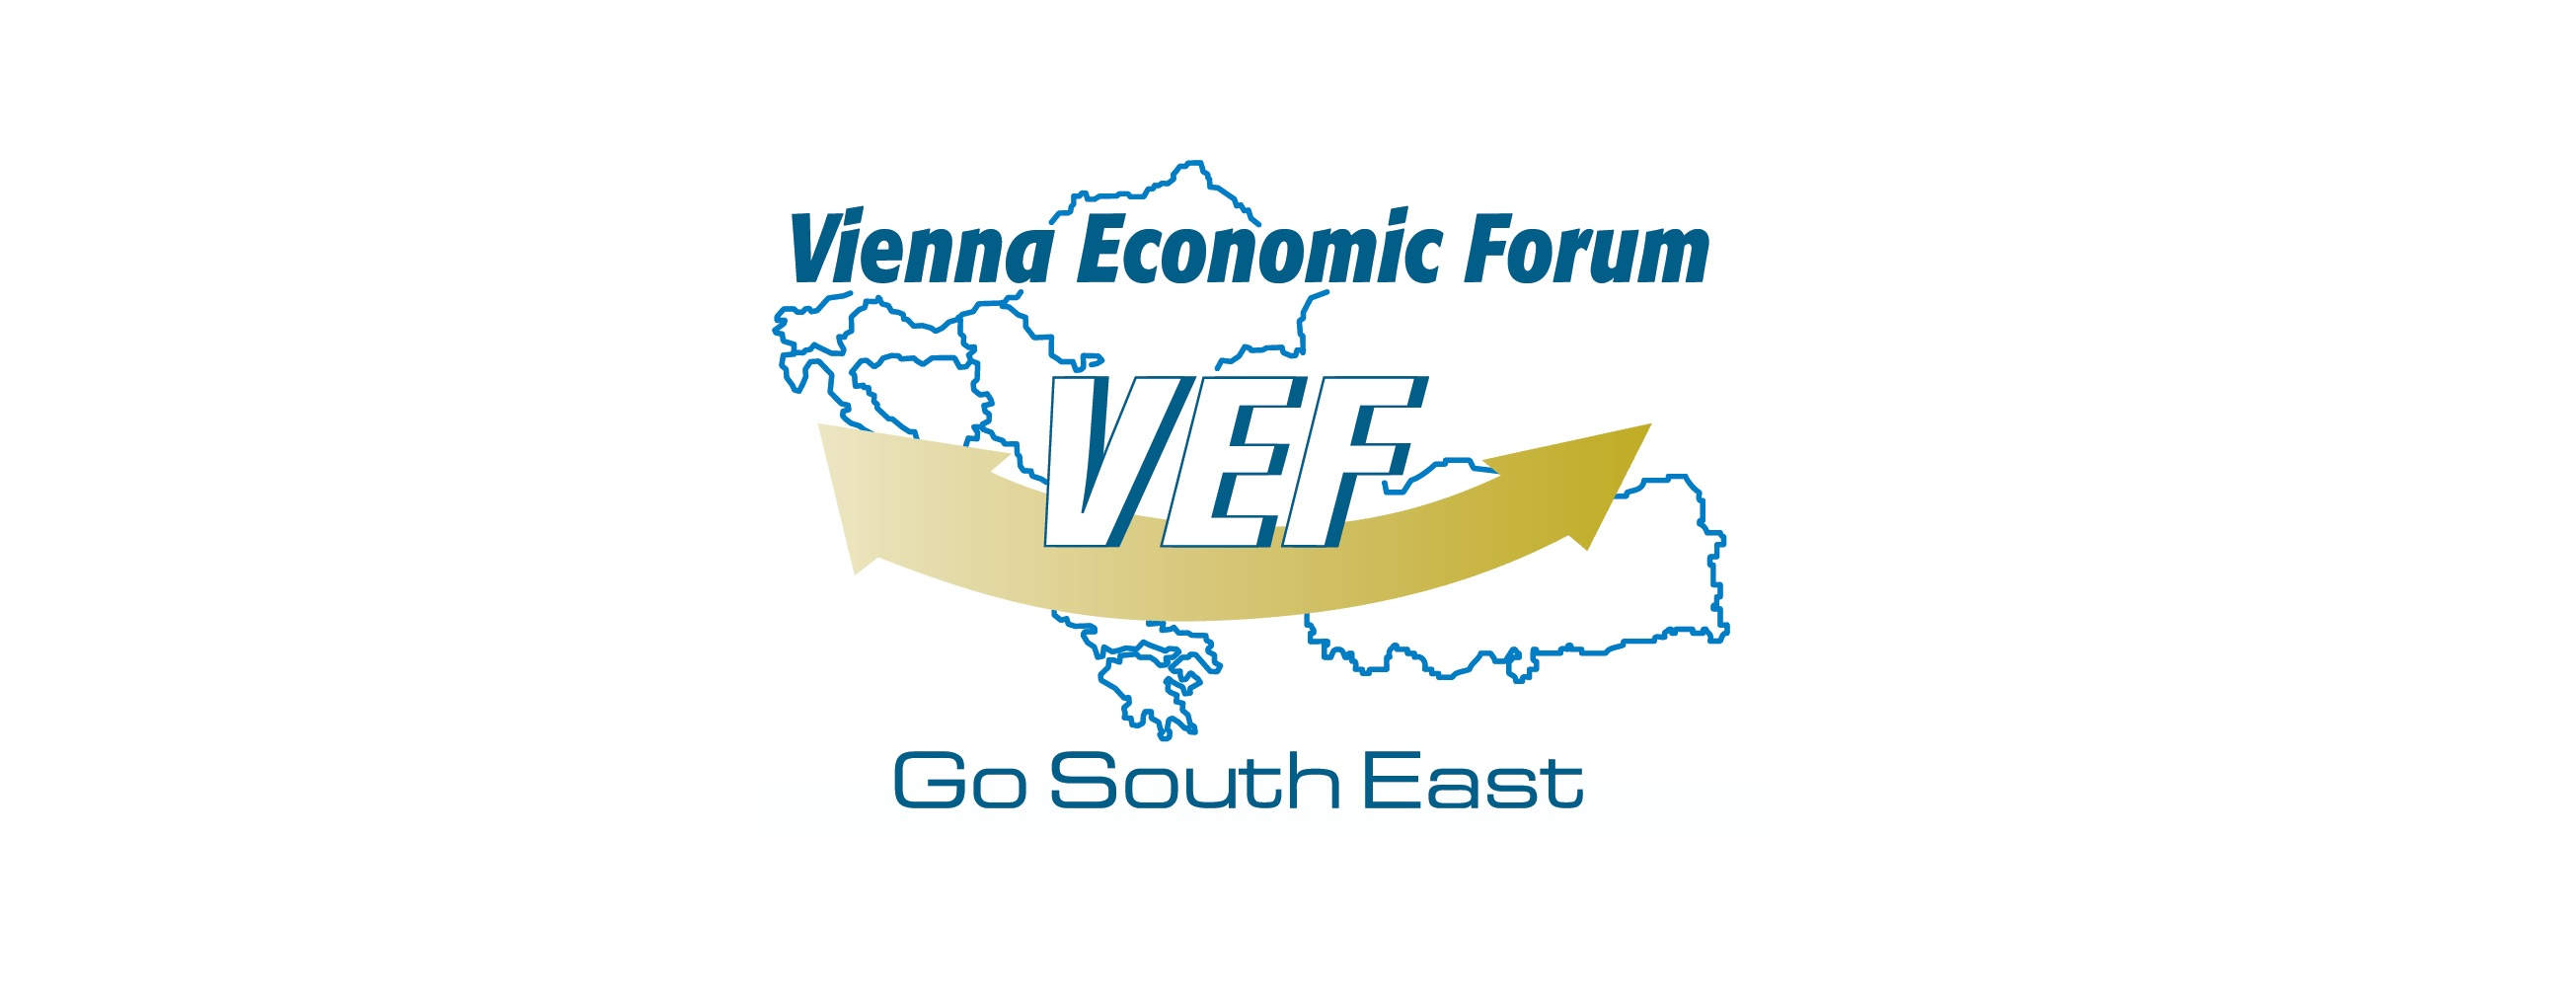 Vienna Economic Forum – Sofia Talks 2018 European Western